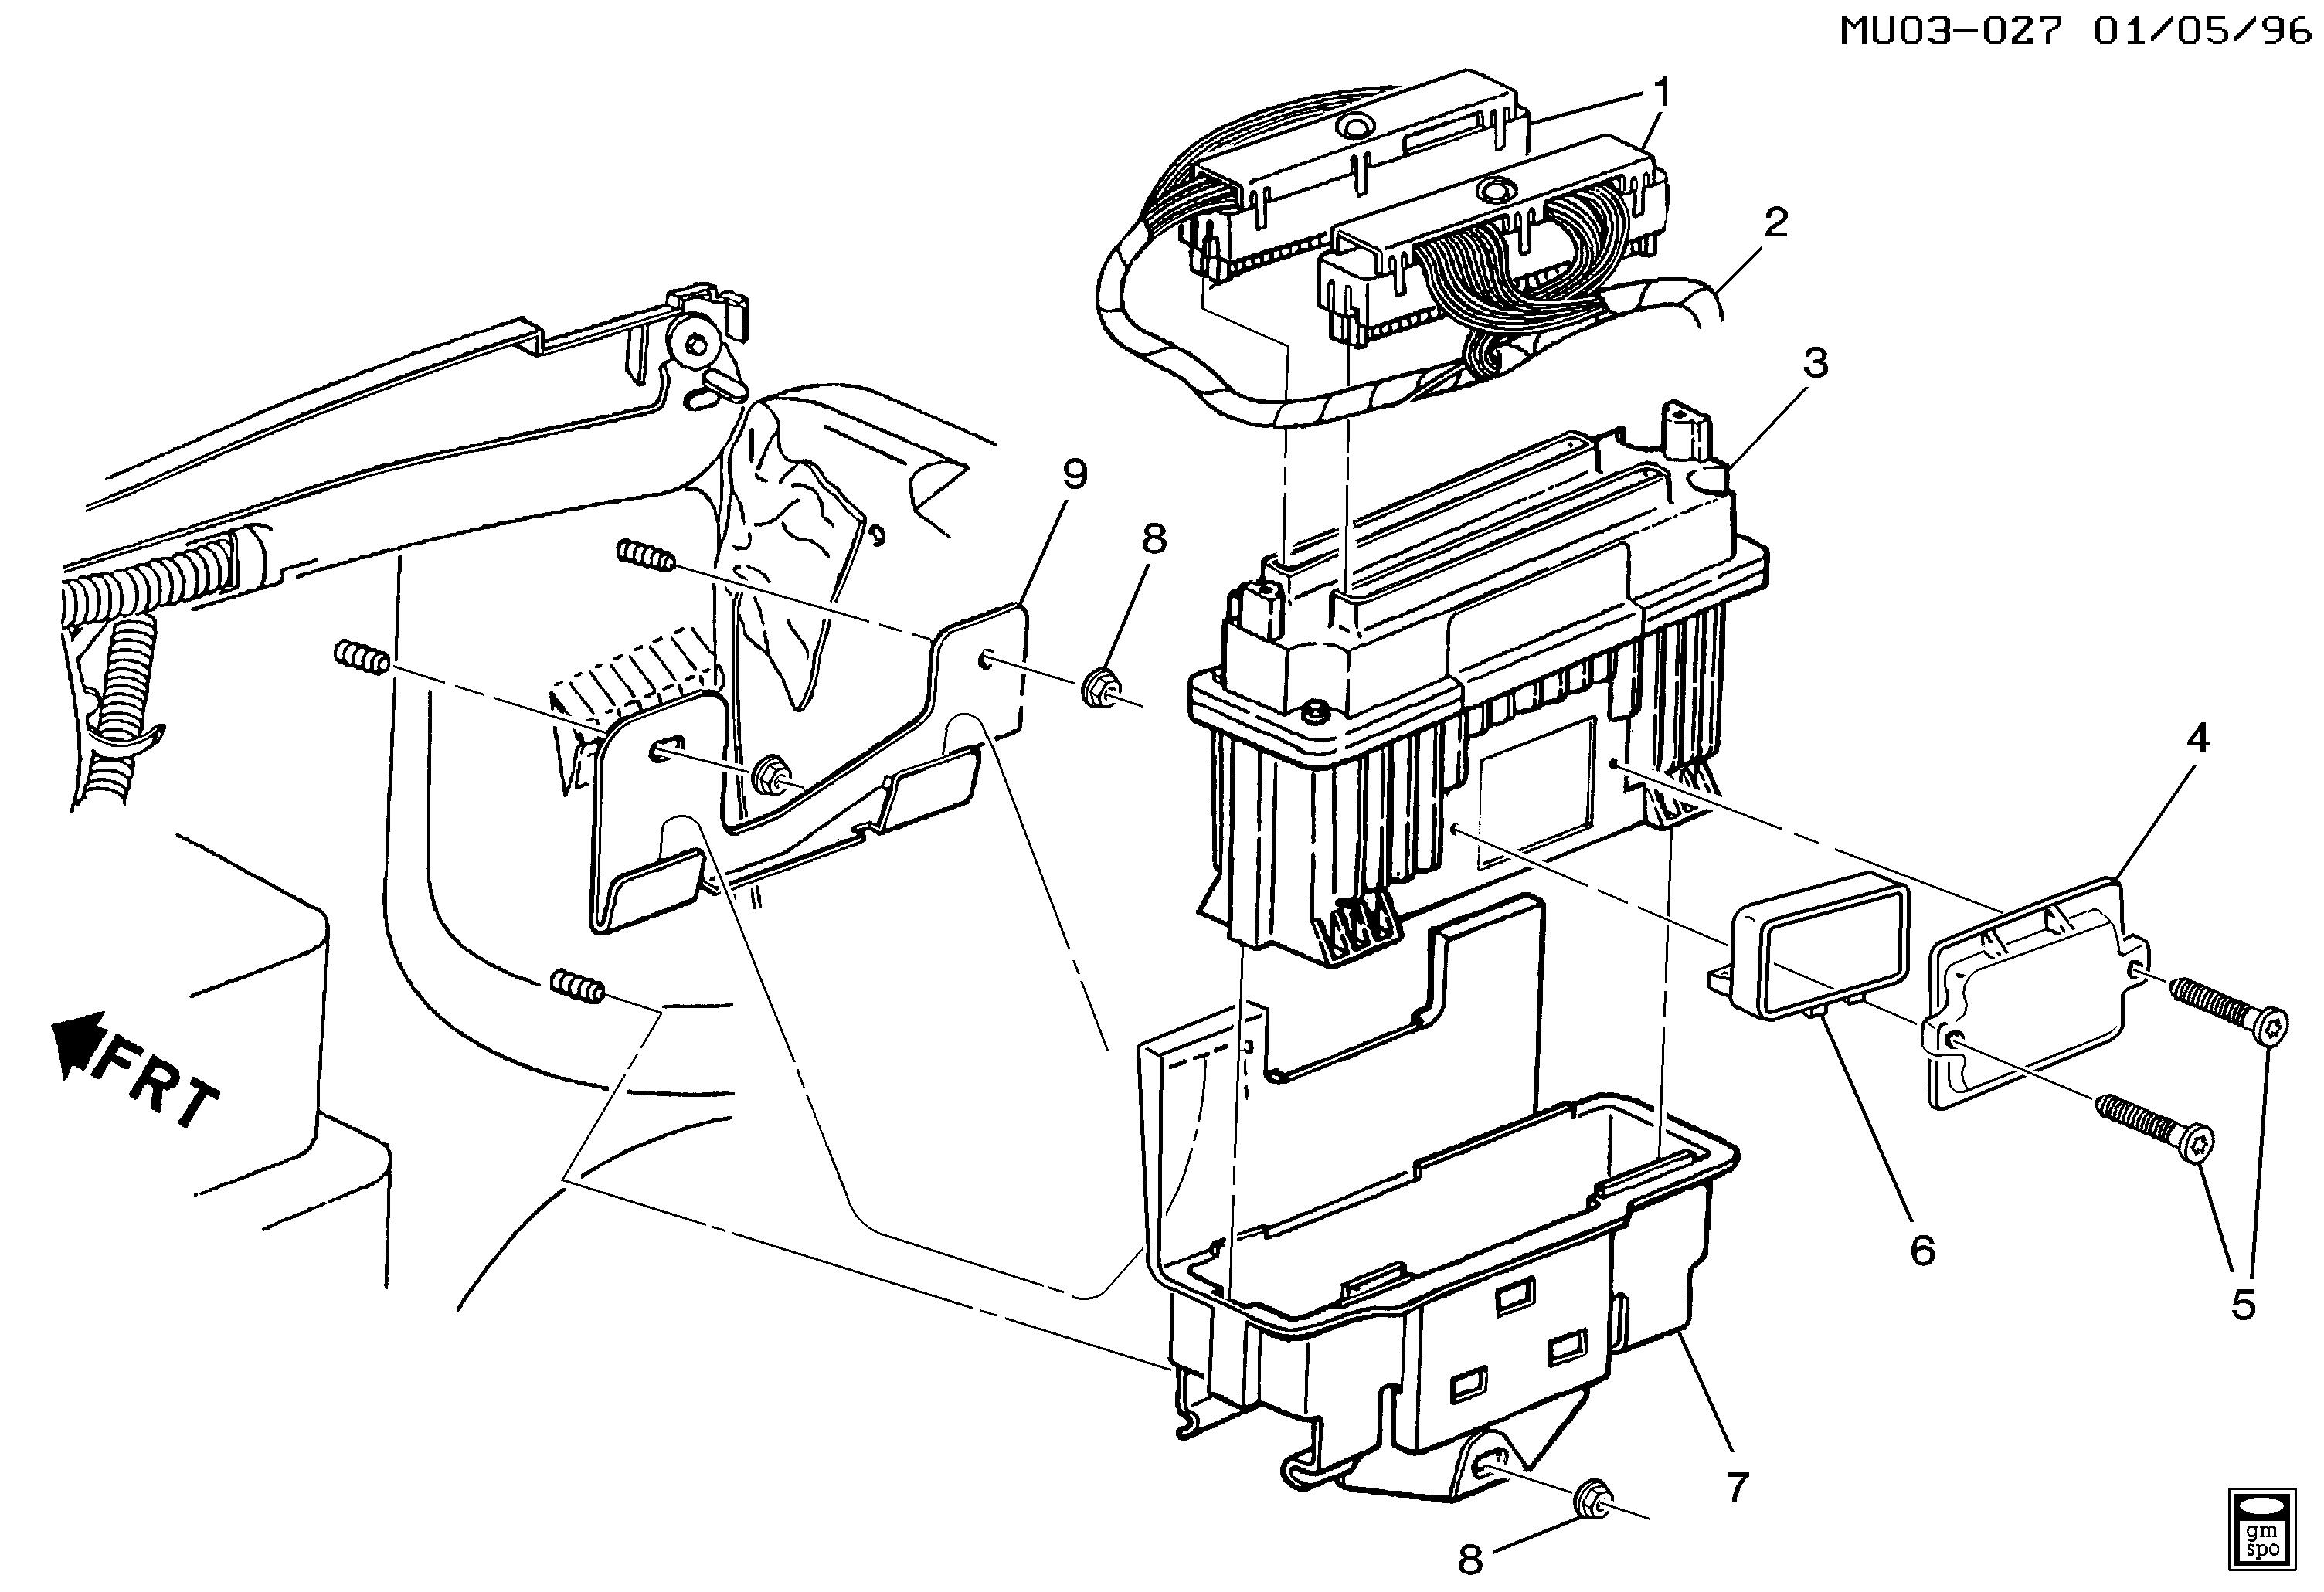 pontiac trans sport wiring diagram pontiac trans sport u p c m module   wiring harness  la1 3 4e  pontiac trans sport u p c m module